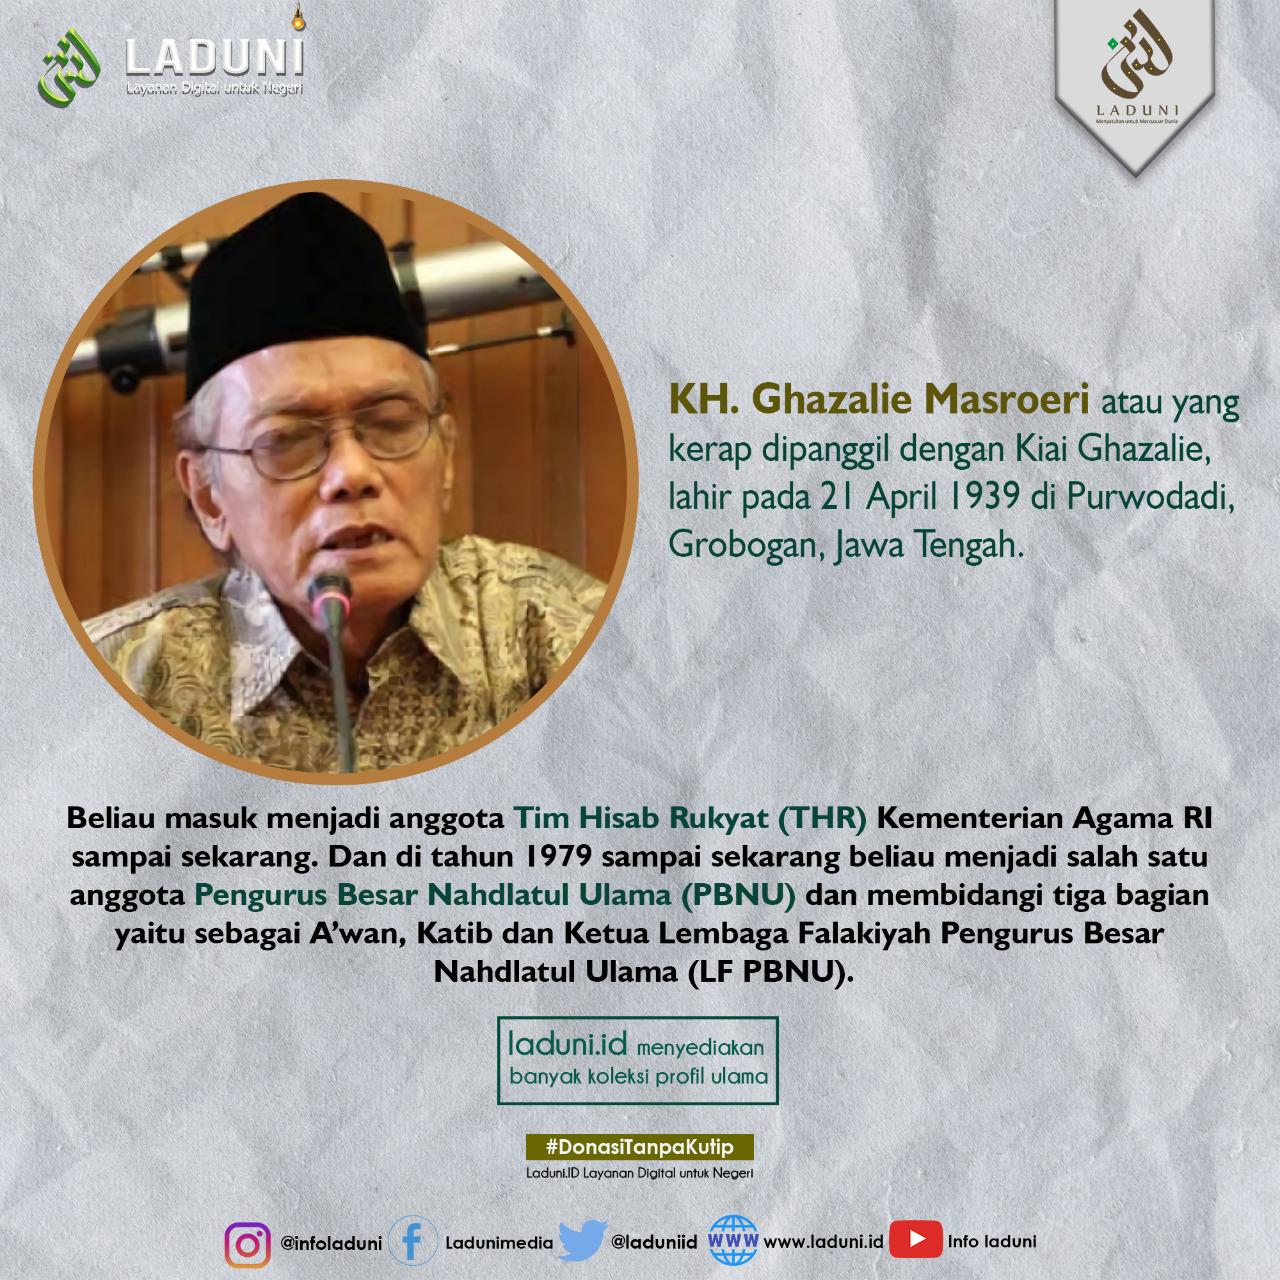 Biografi KH. Ghozalie Masroeri